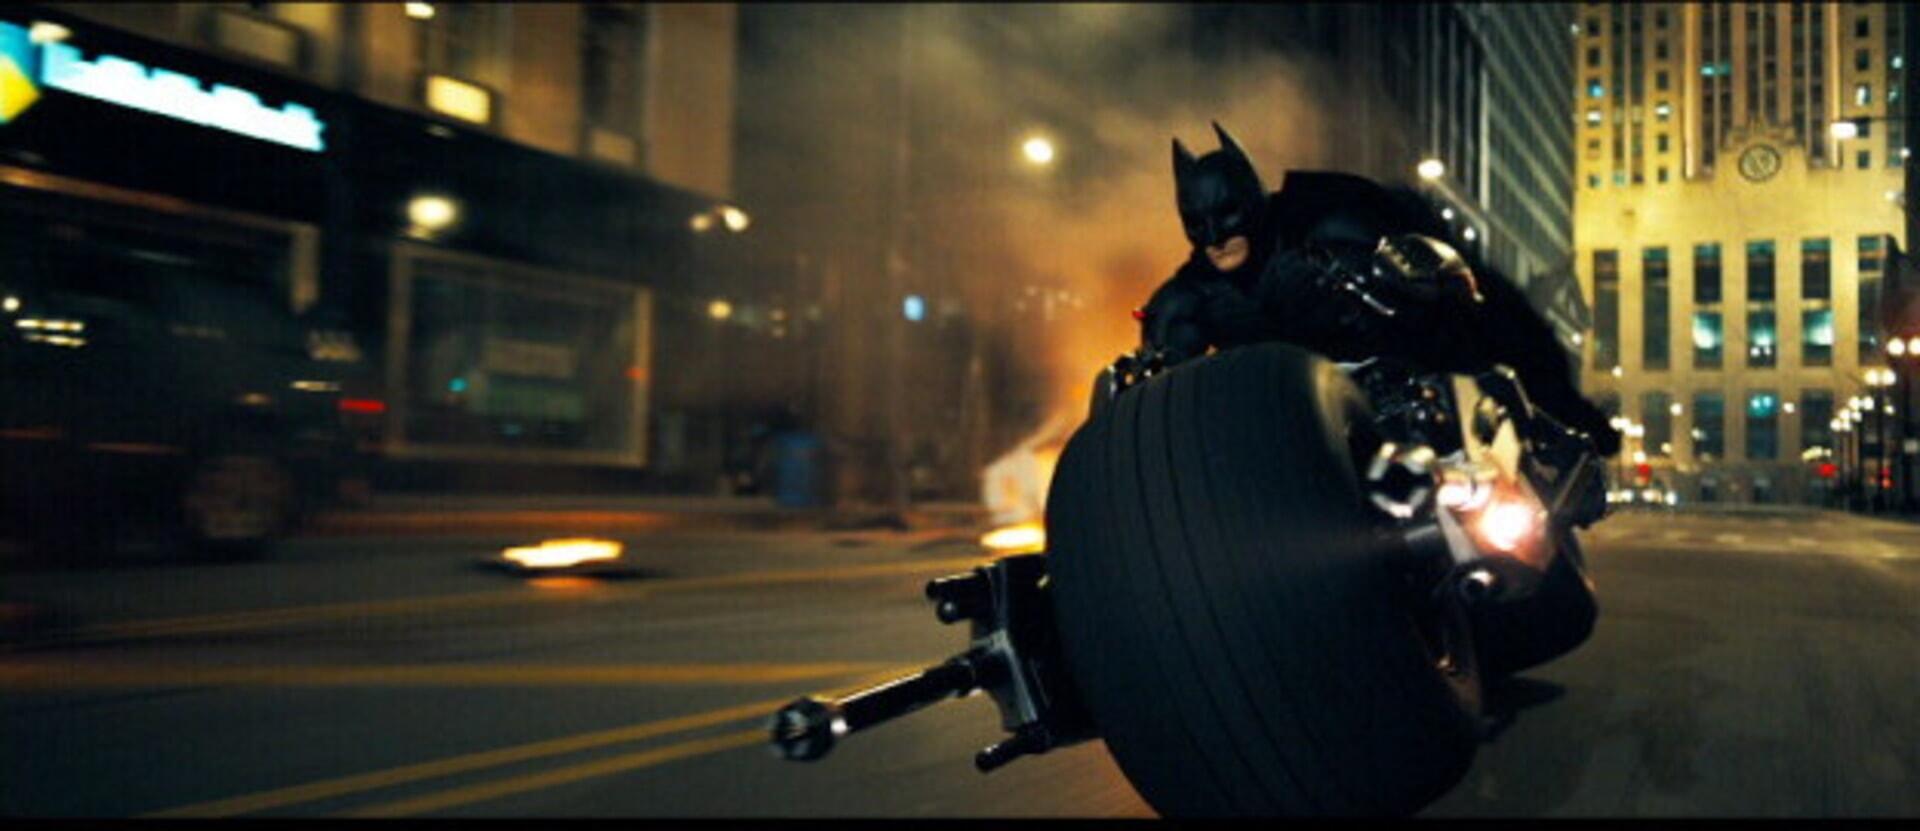 The Dark Knight - Image 24